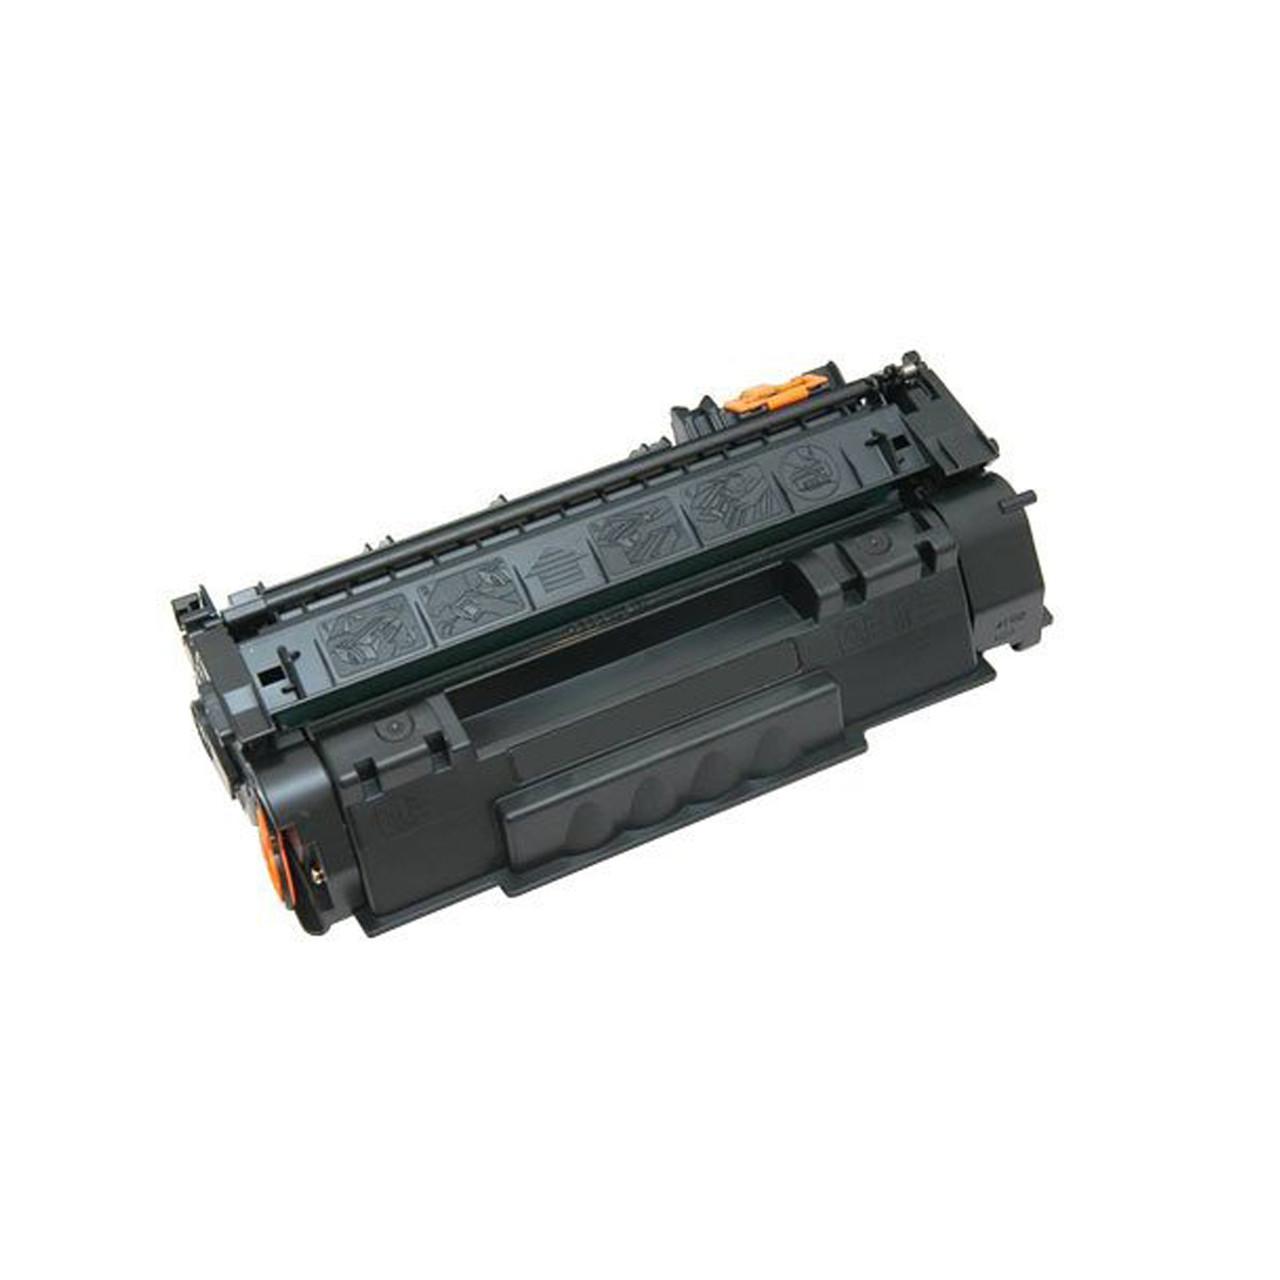 2pk MLT-D208L Black Toner Cartridge for Samsung SCX-5635 SCX-5635FN High Yield